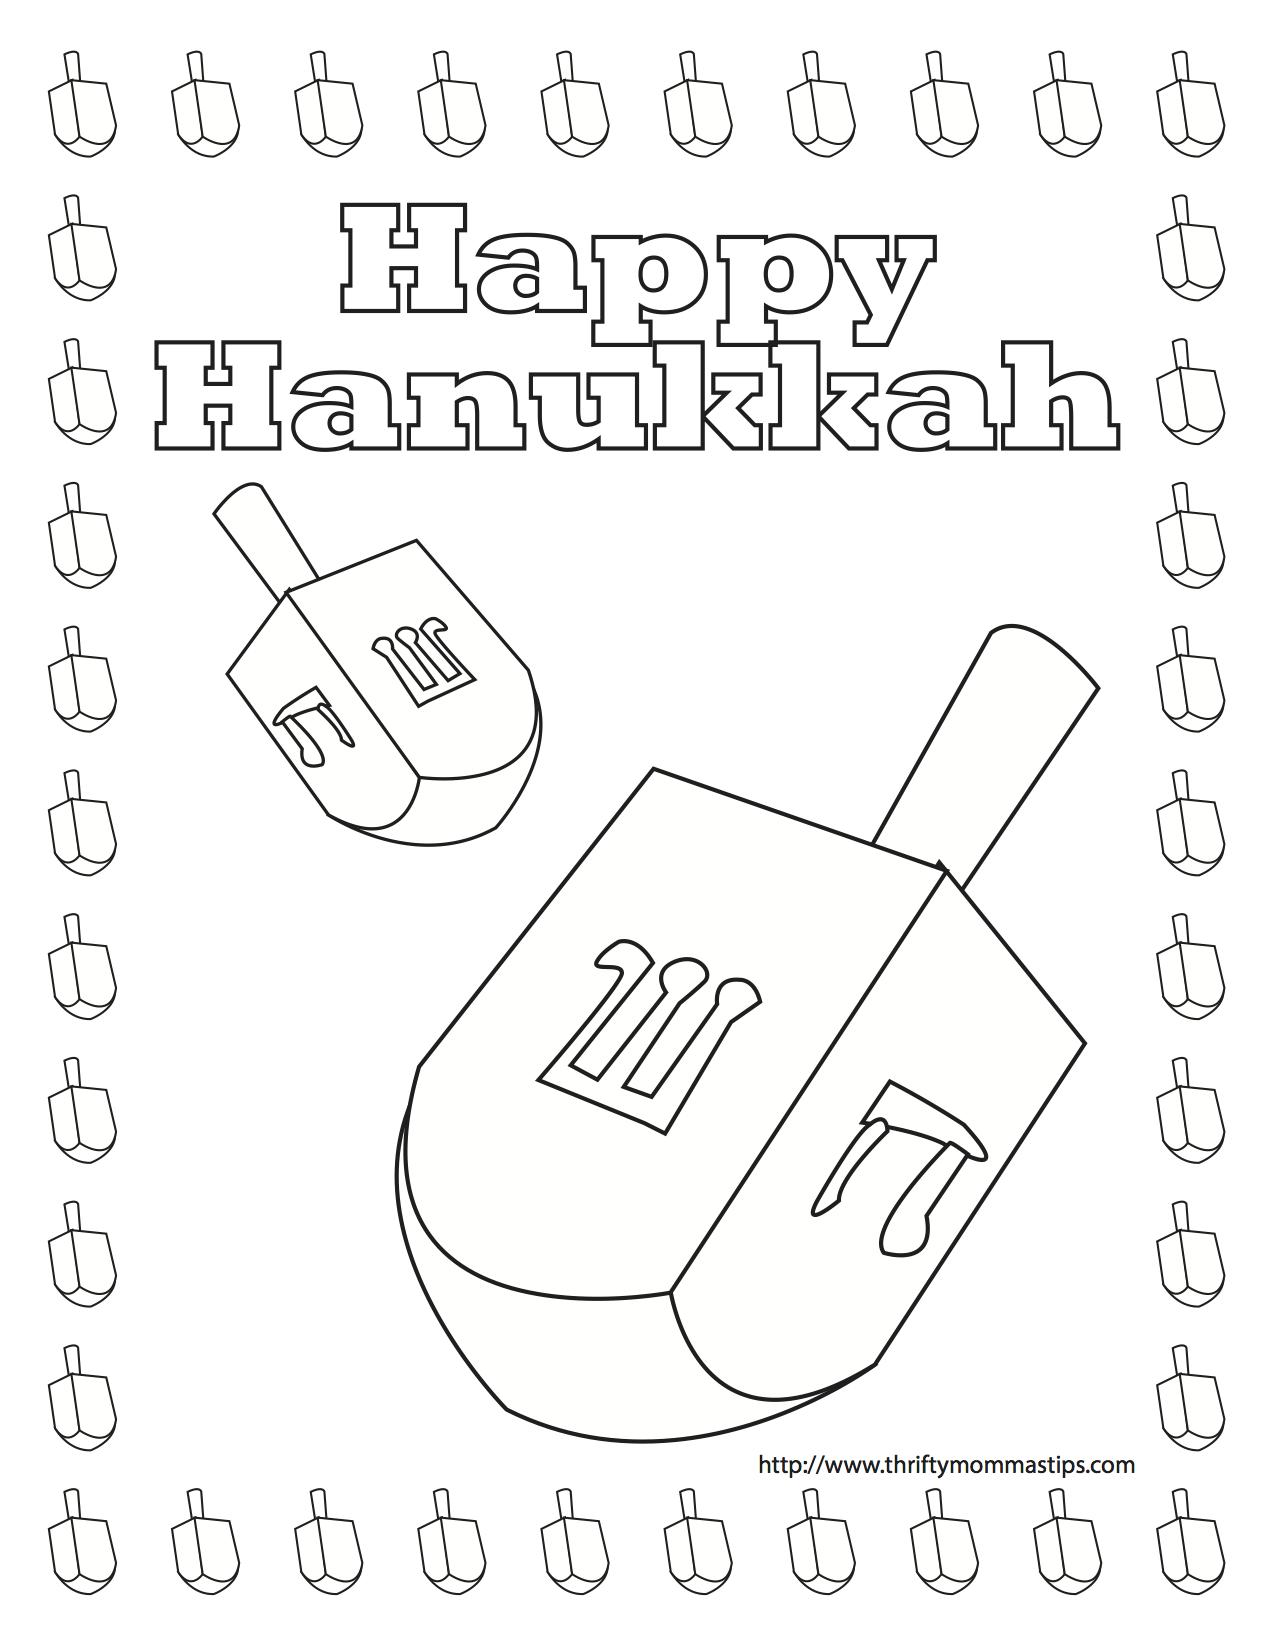 Happy Hanukkah Free Printable Dreidel coloring pages